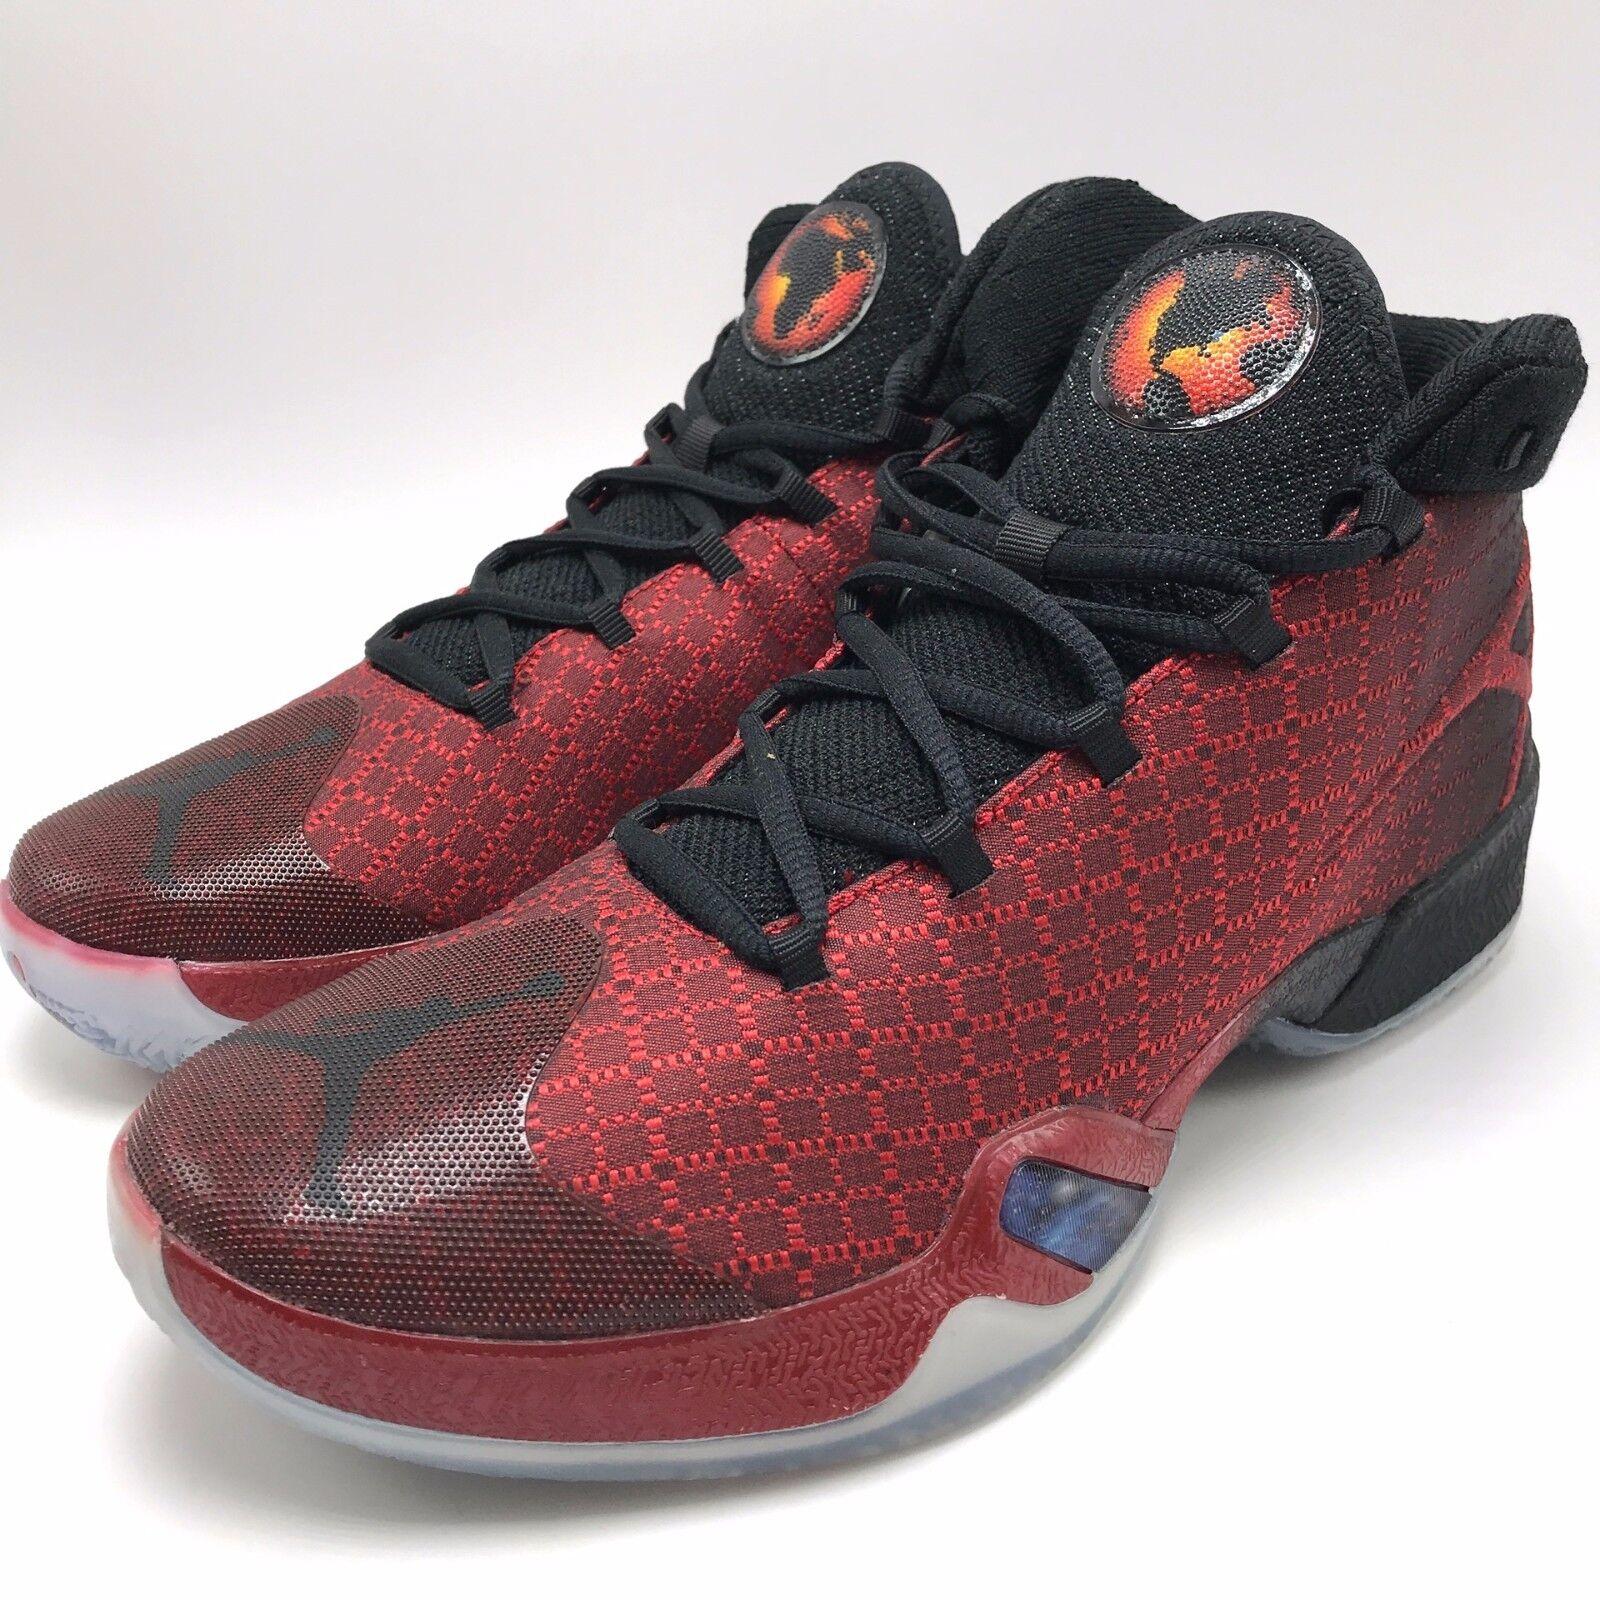 Nike jordan xxx männer - schwarz rot / rot - schwarz 811006-601 im fitnessstudio